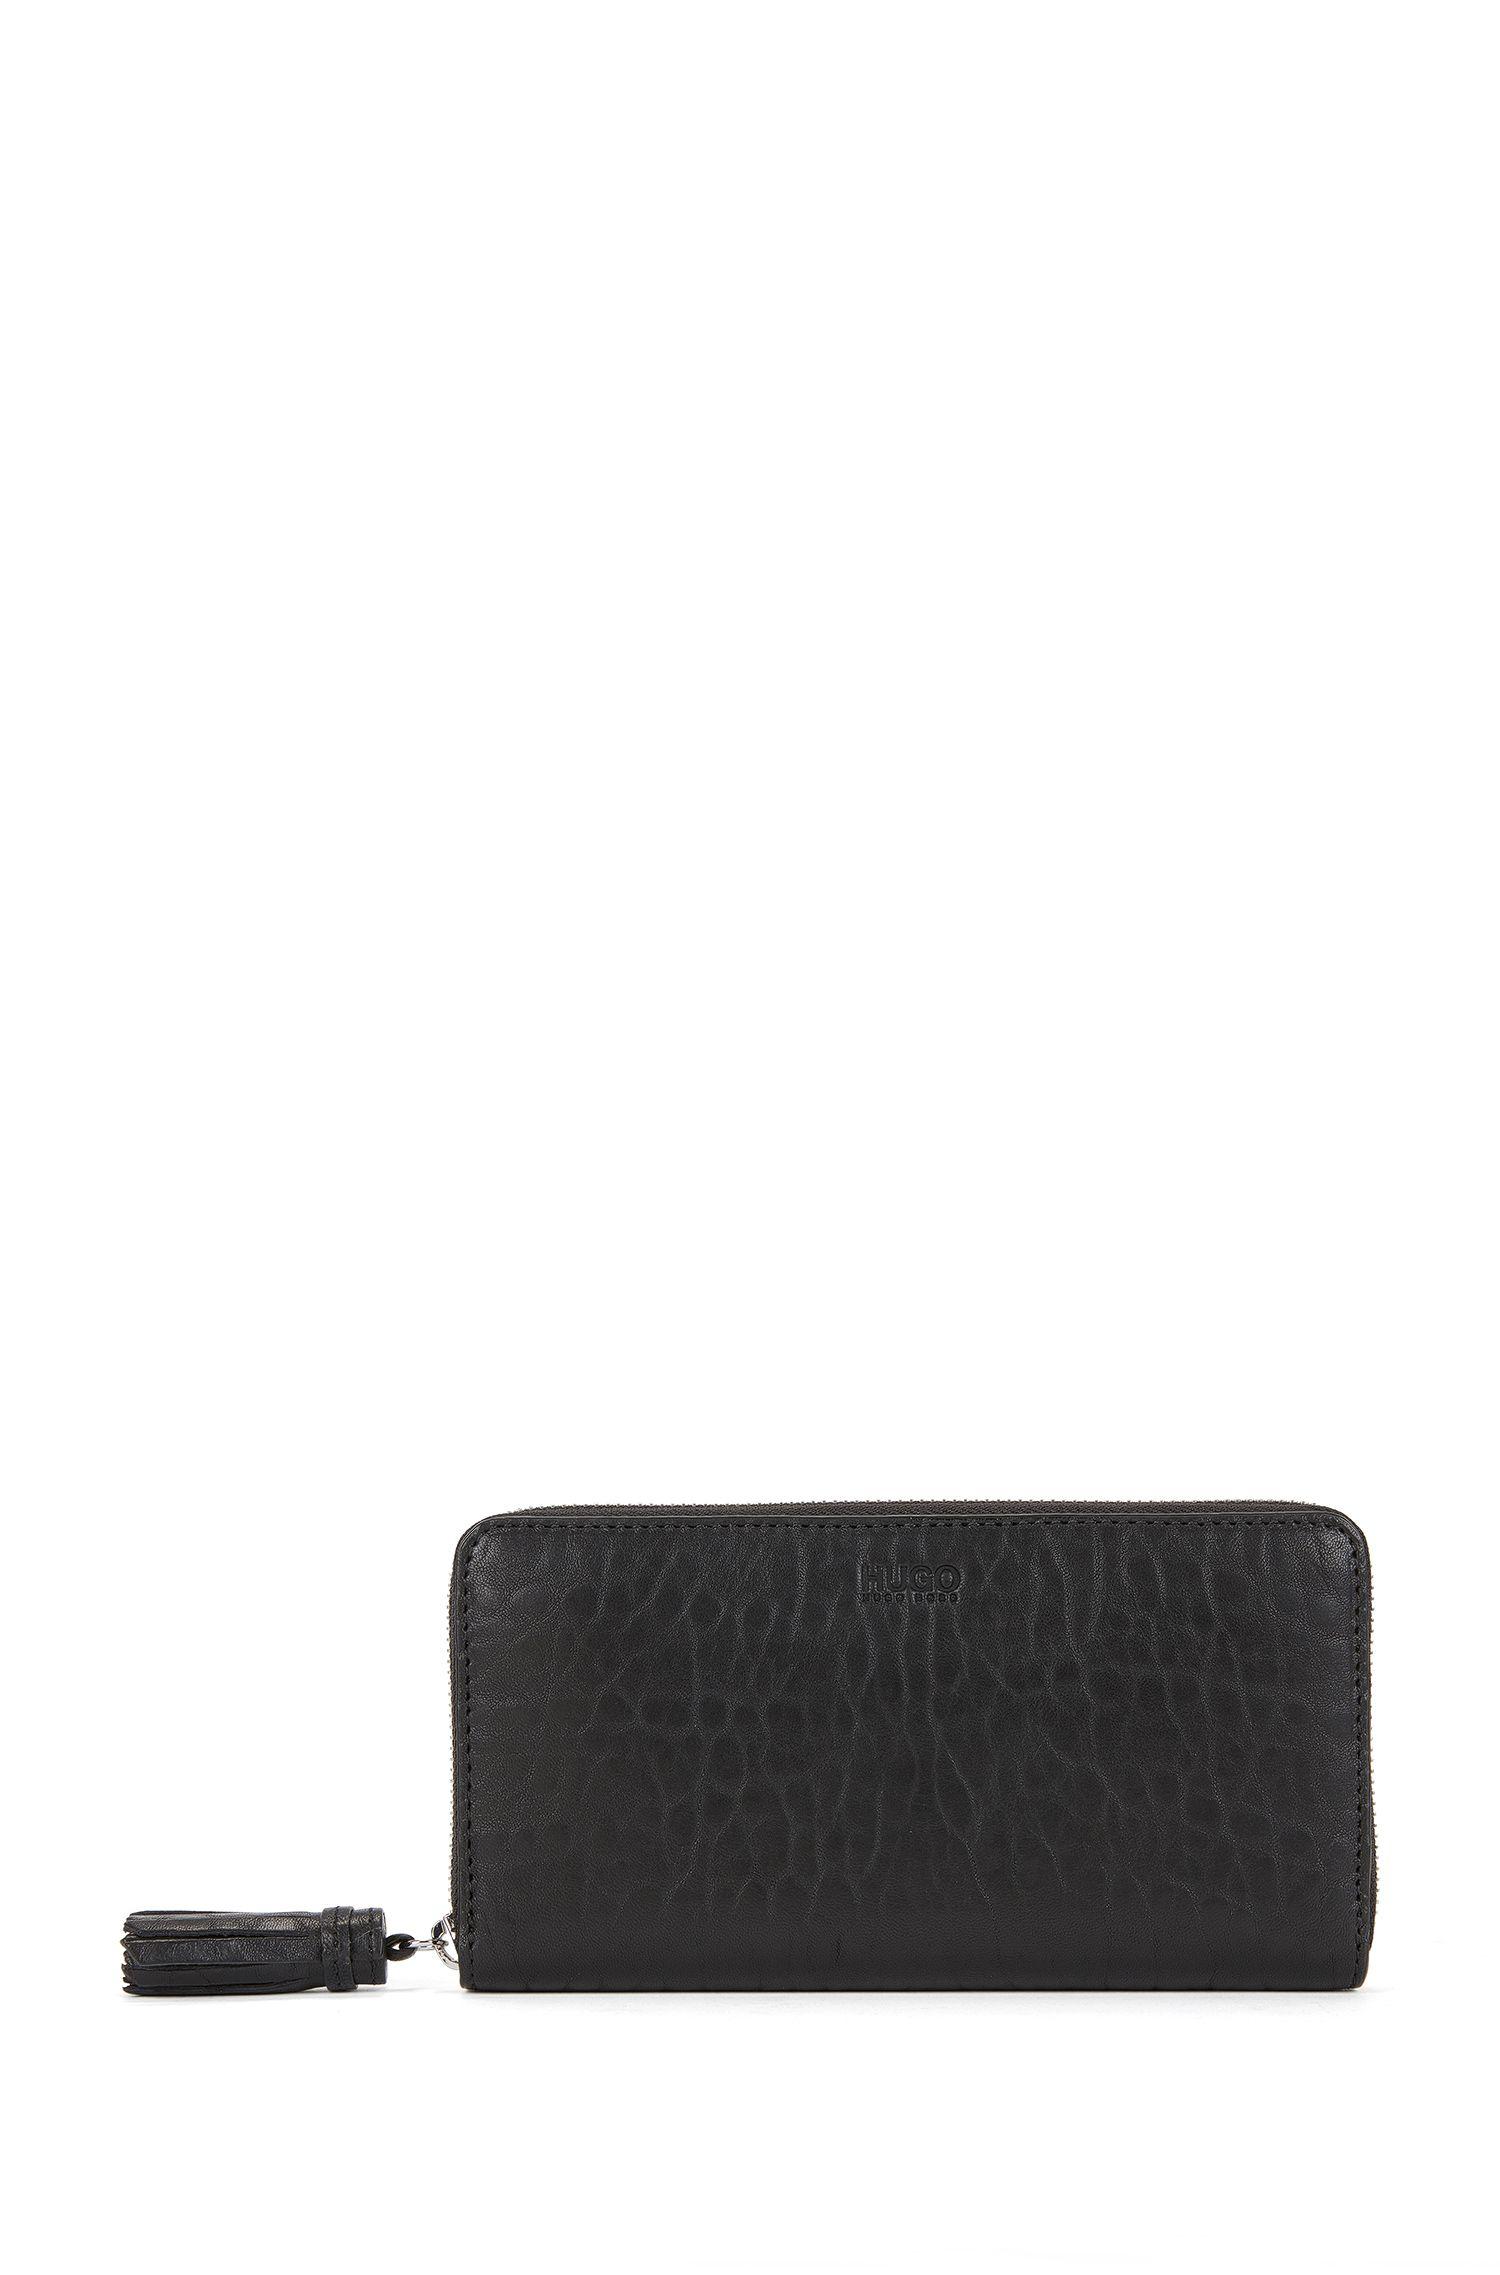 Zip-around wallet in rich leather with tassel